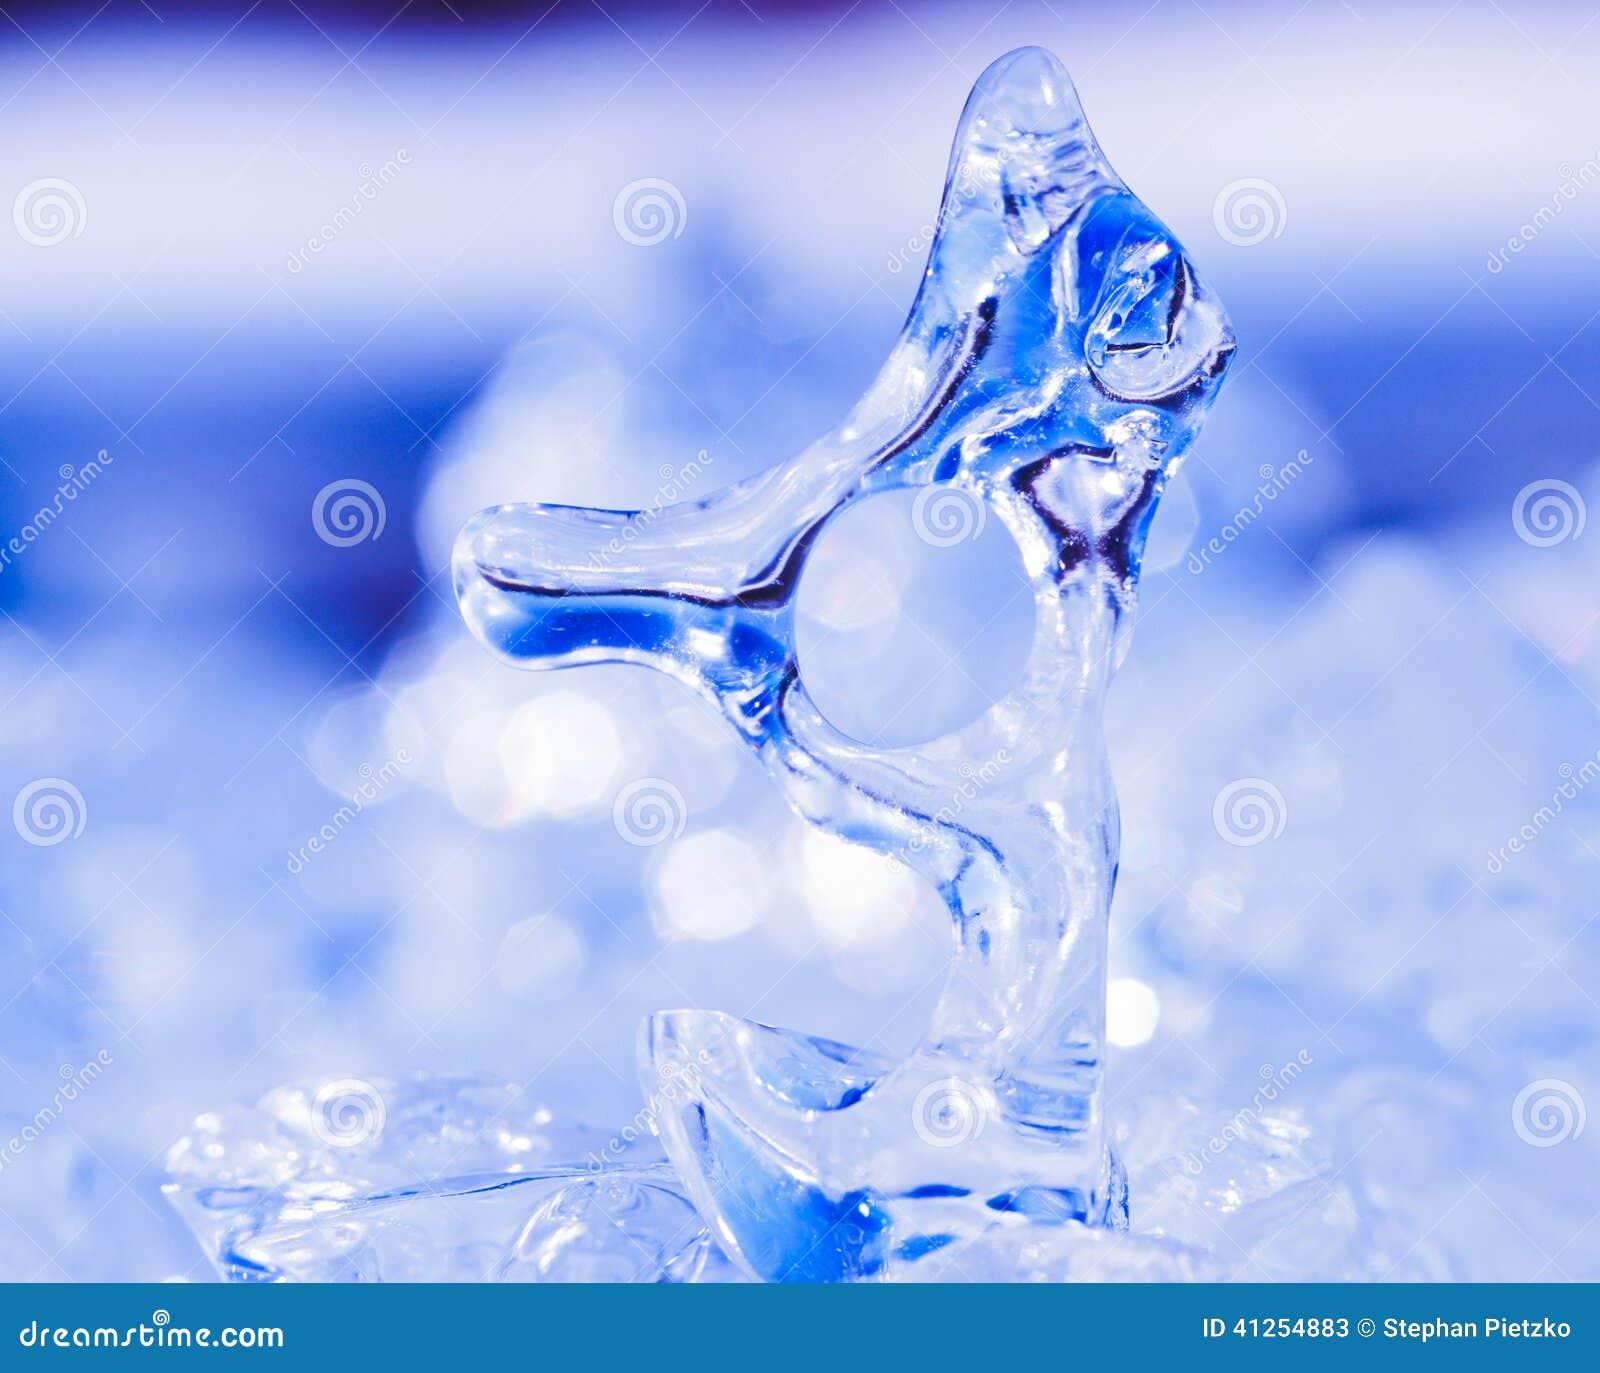 Frozen Natural Ice Sculpture Nature Abstract Art Stock